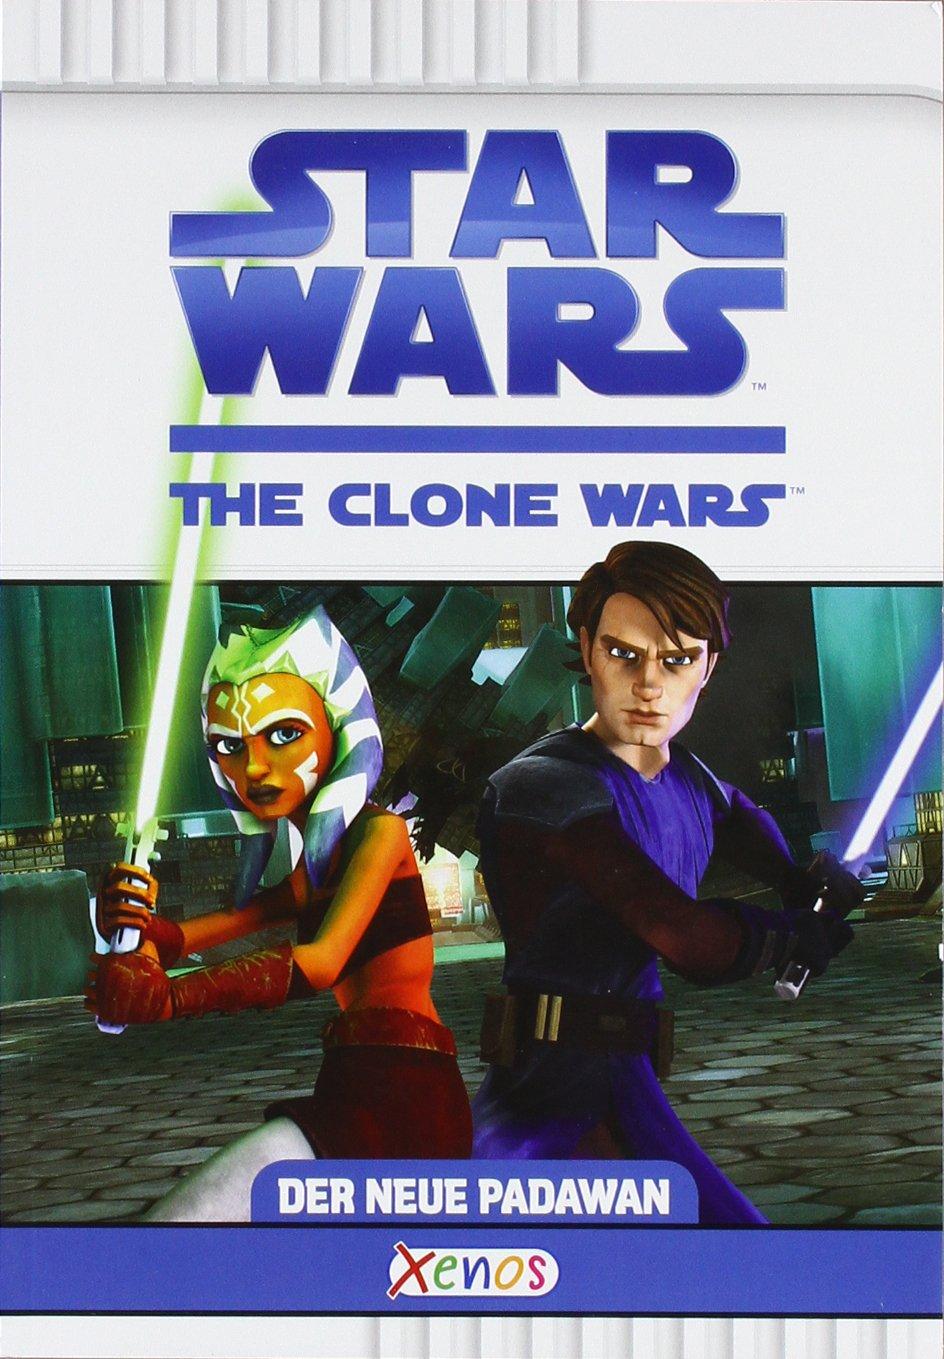 Star Wars The Clone Wars: Der neue Padawan